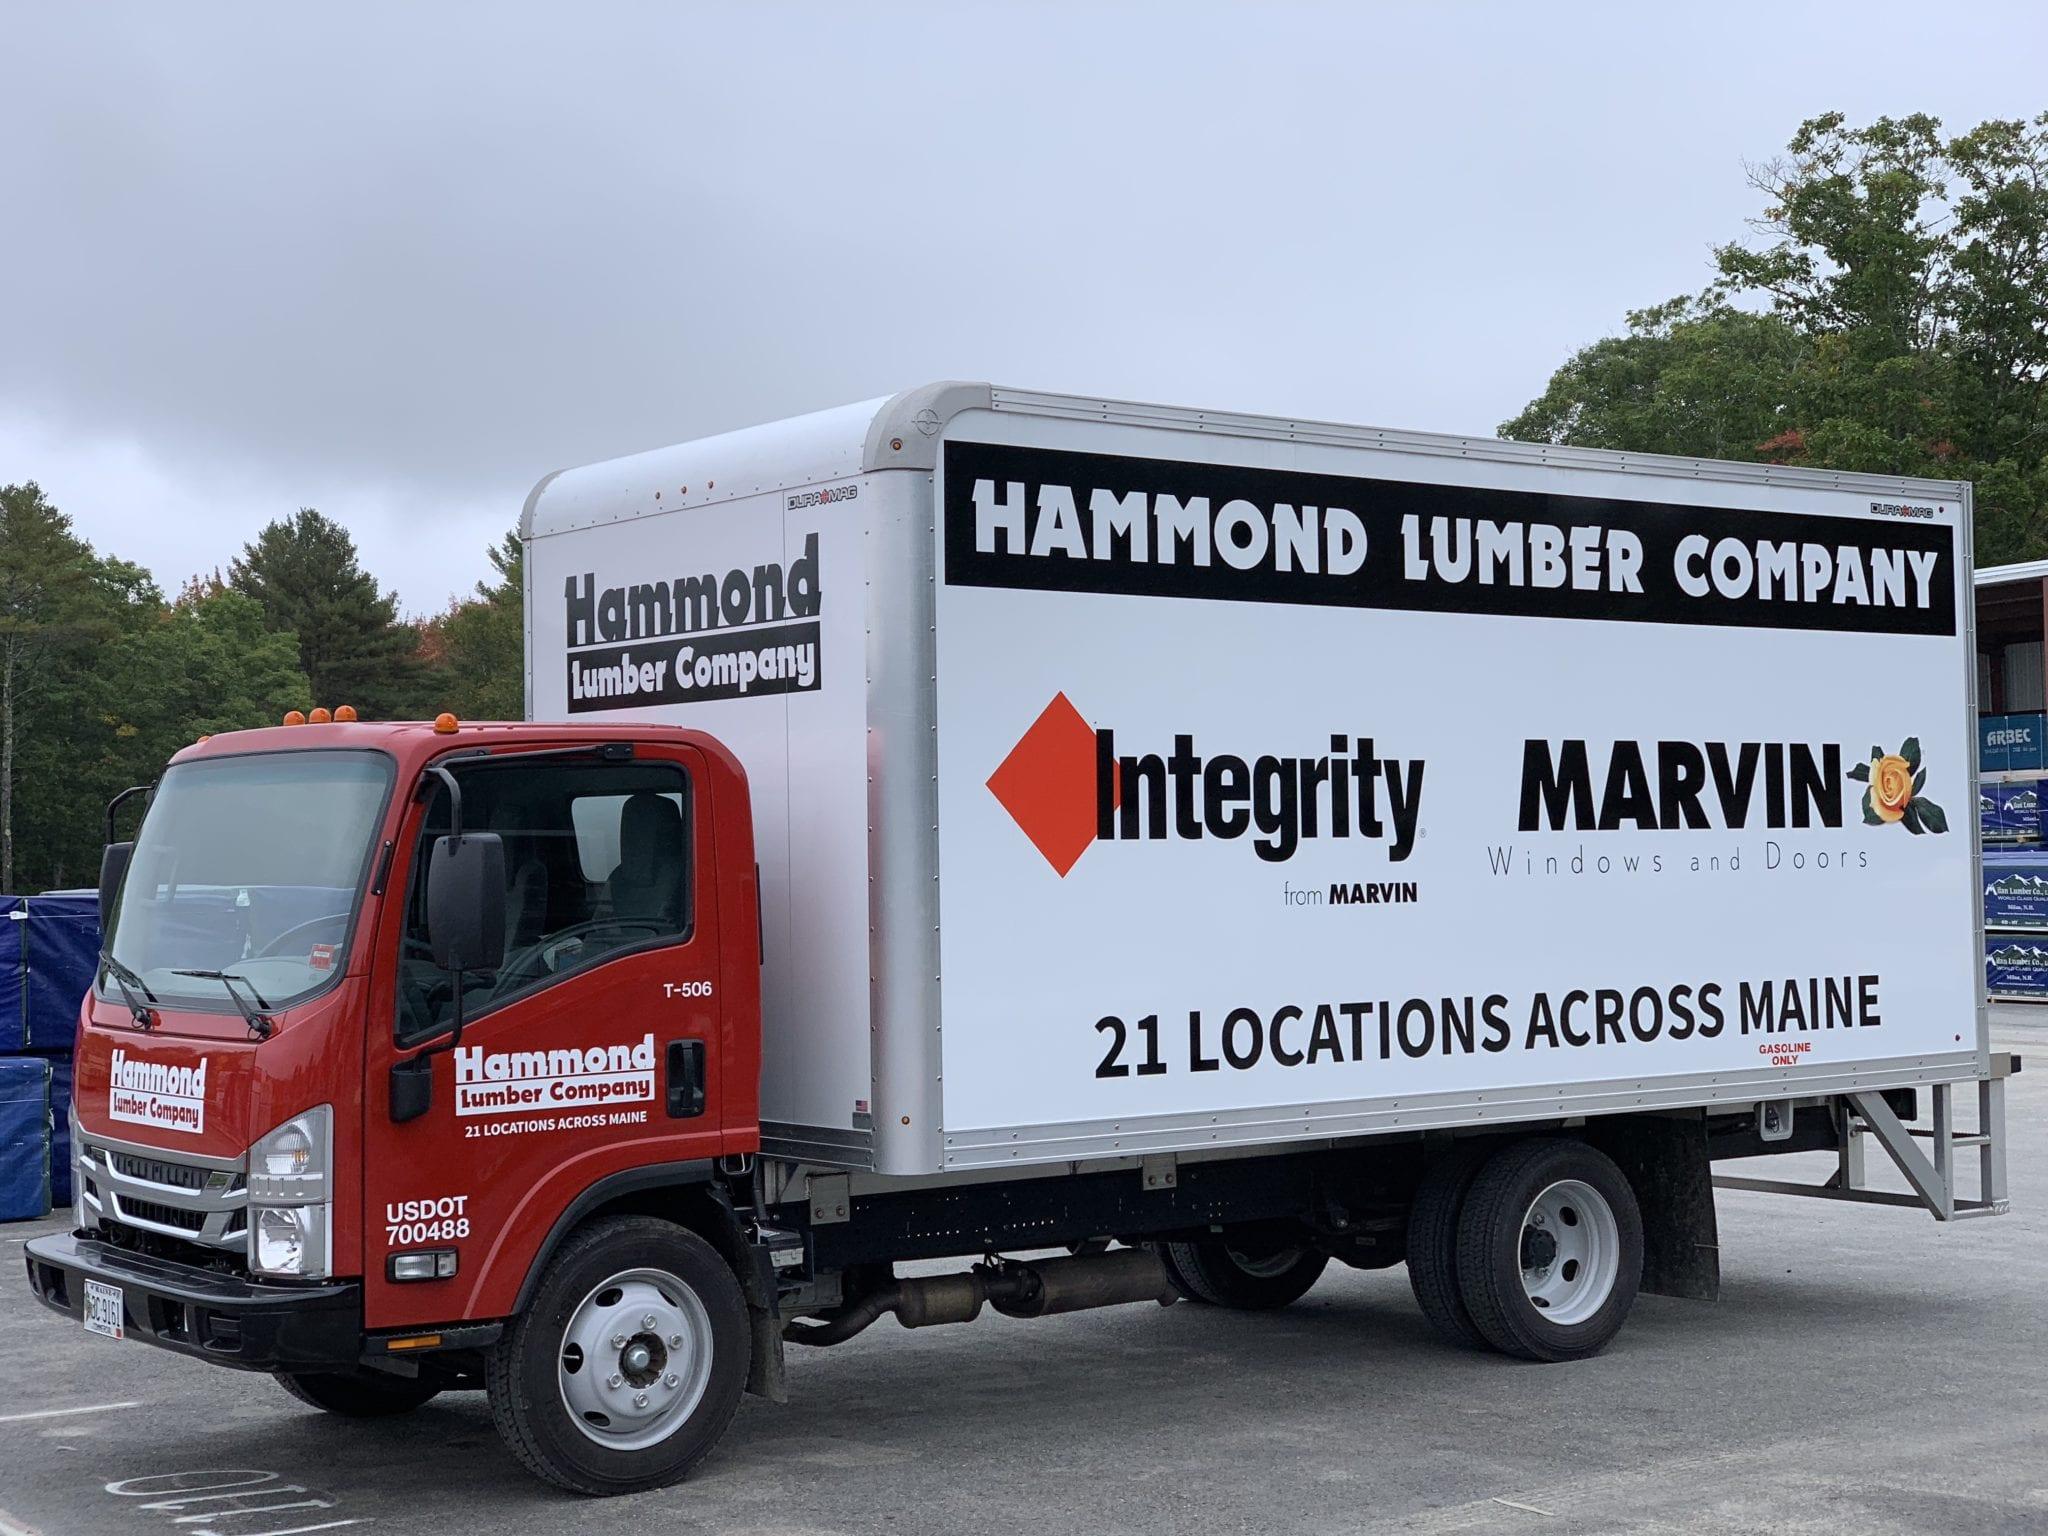 Hammond Lumber Company Box Truck